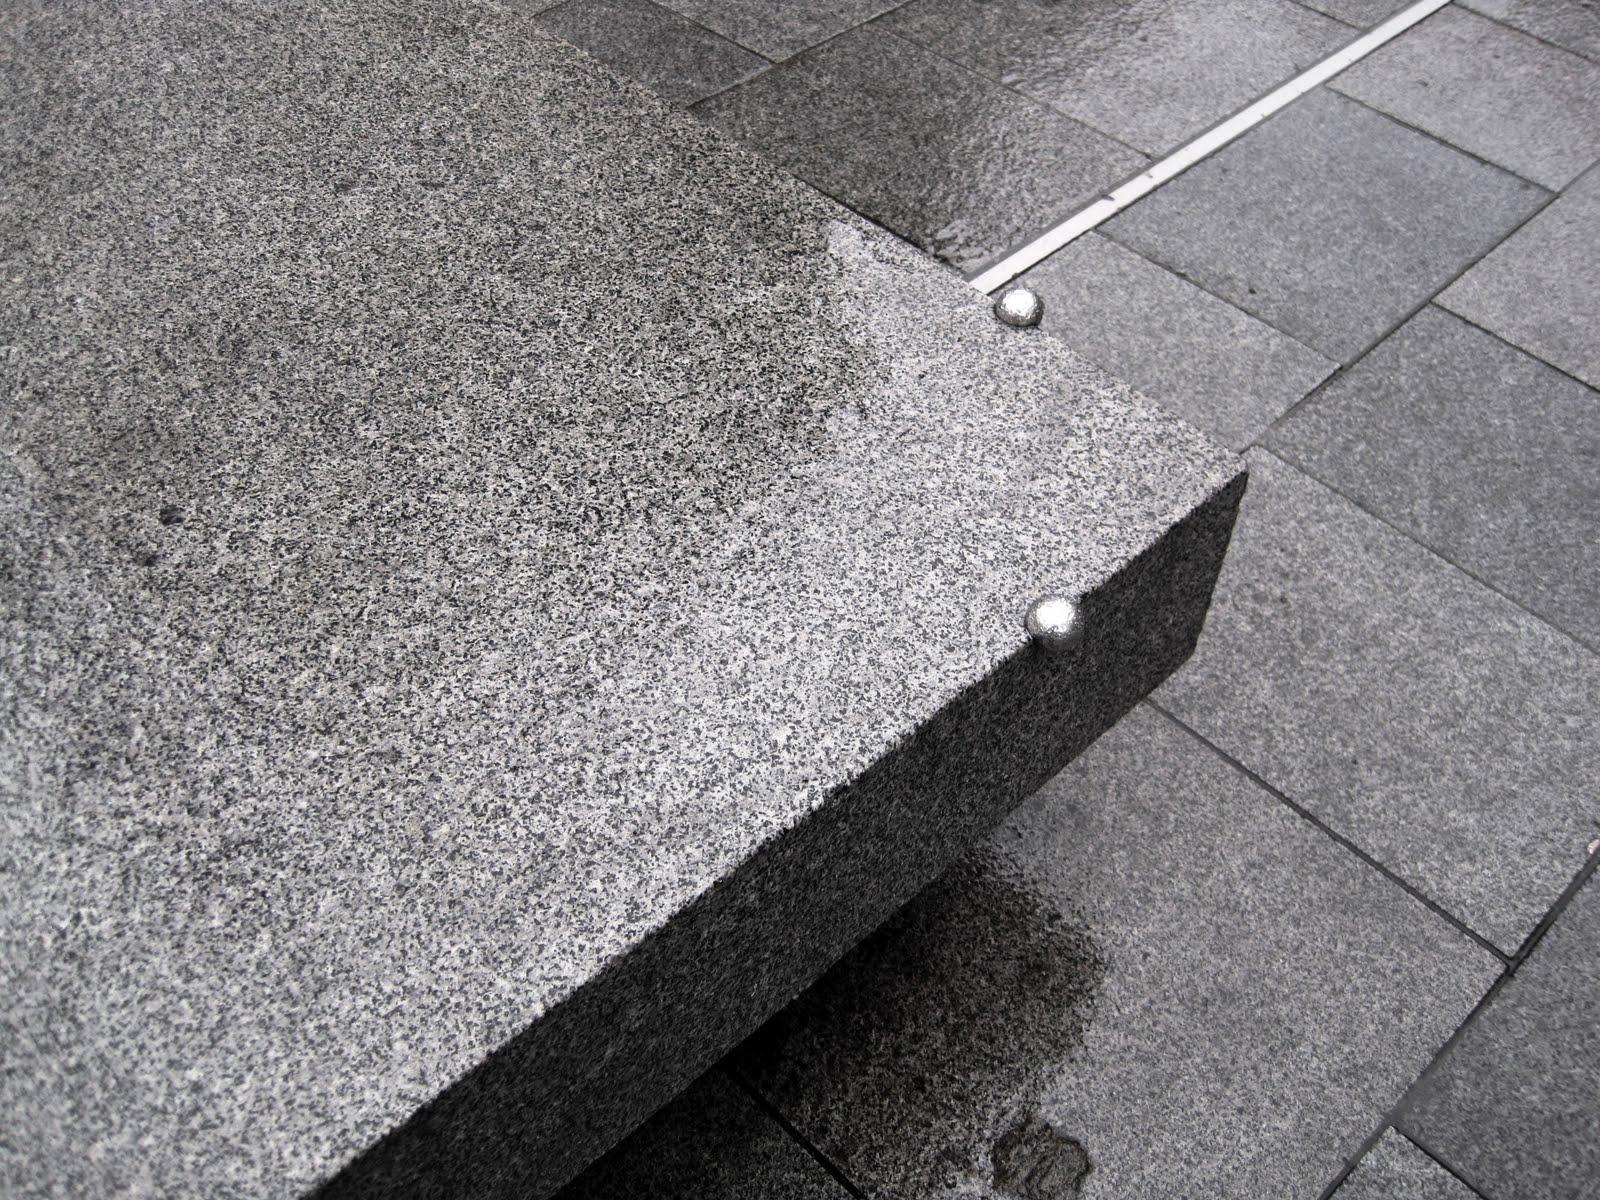 [stone+bench.jpg]